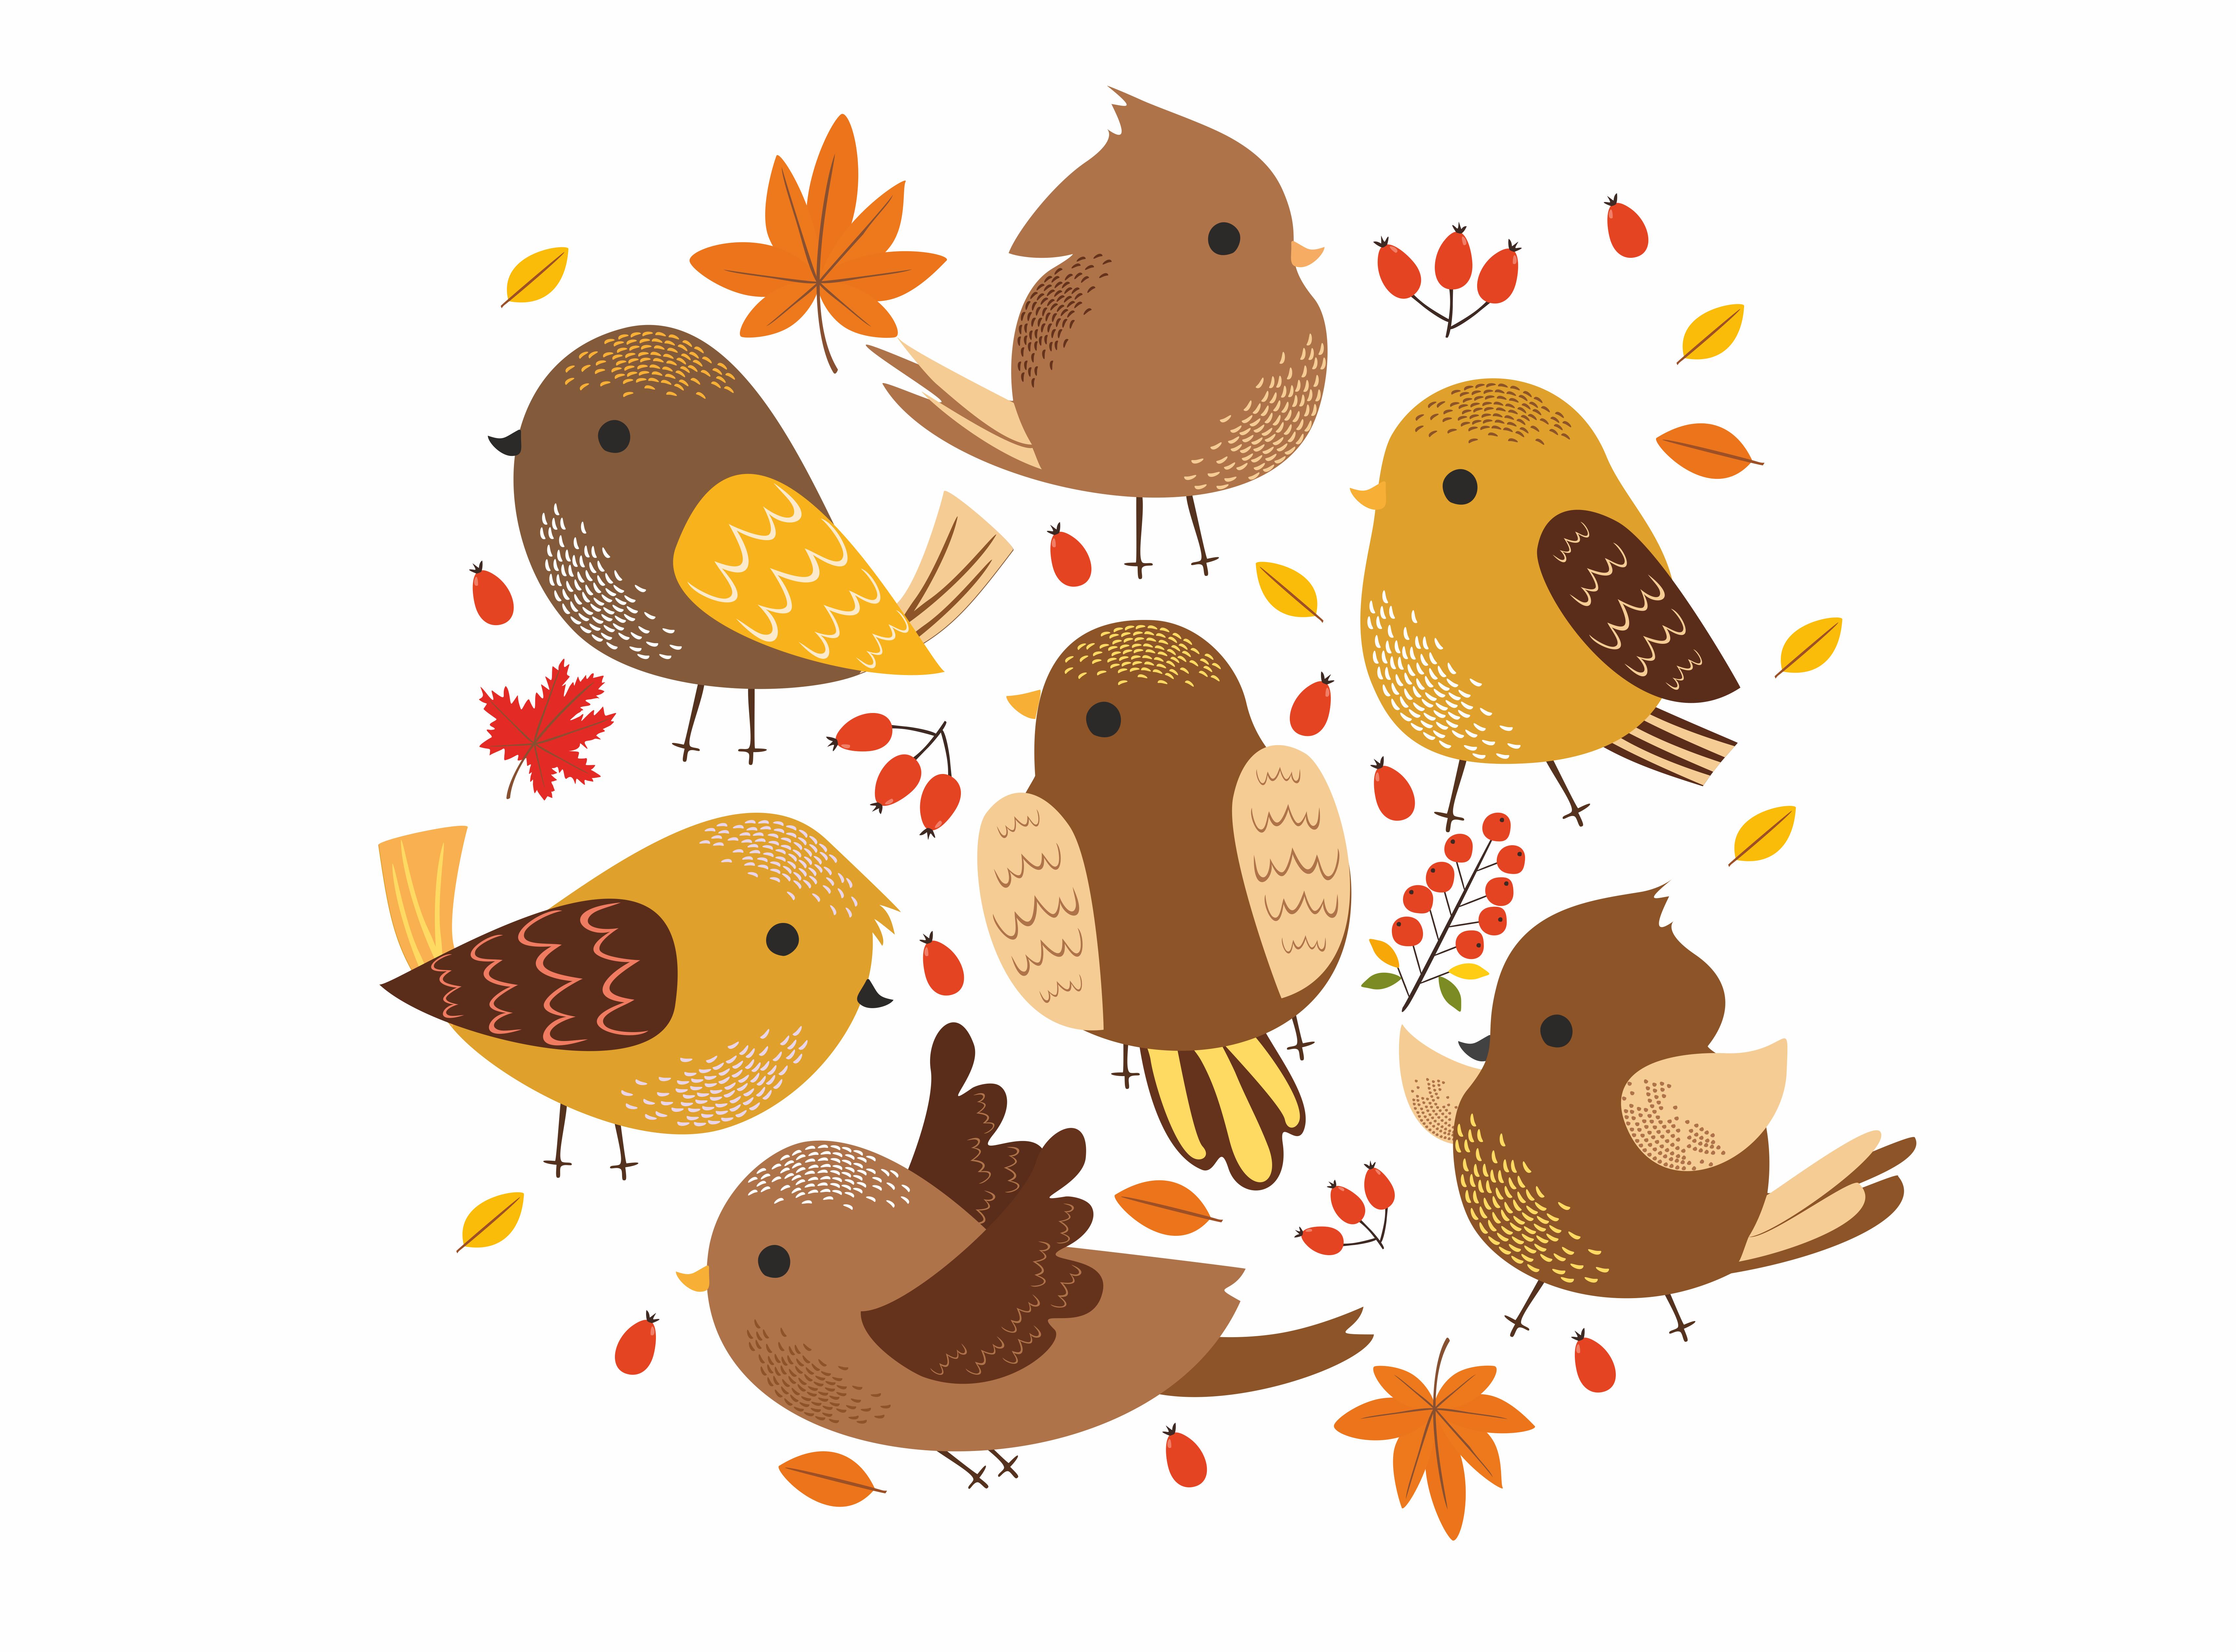 Birds set 2 (vector,jpg,png) example image 5